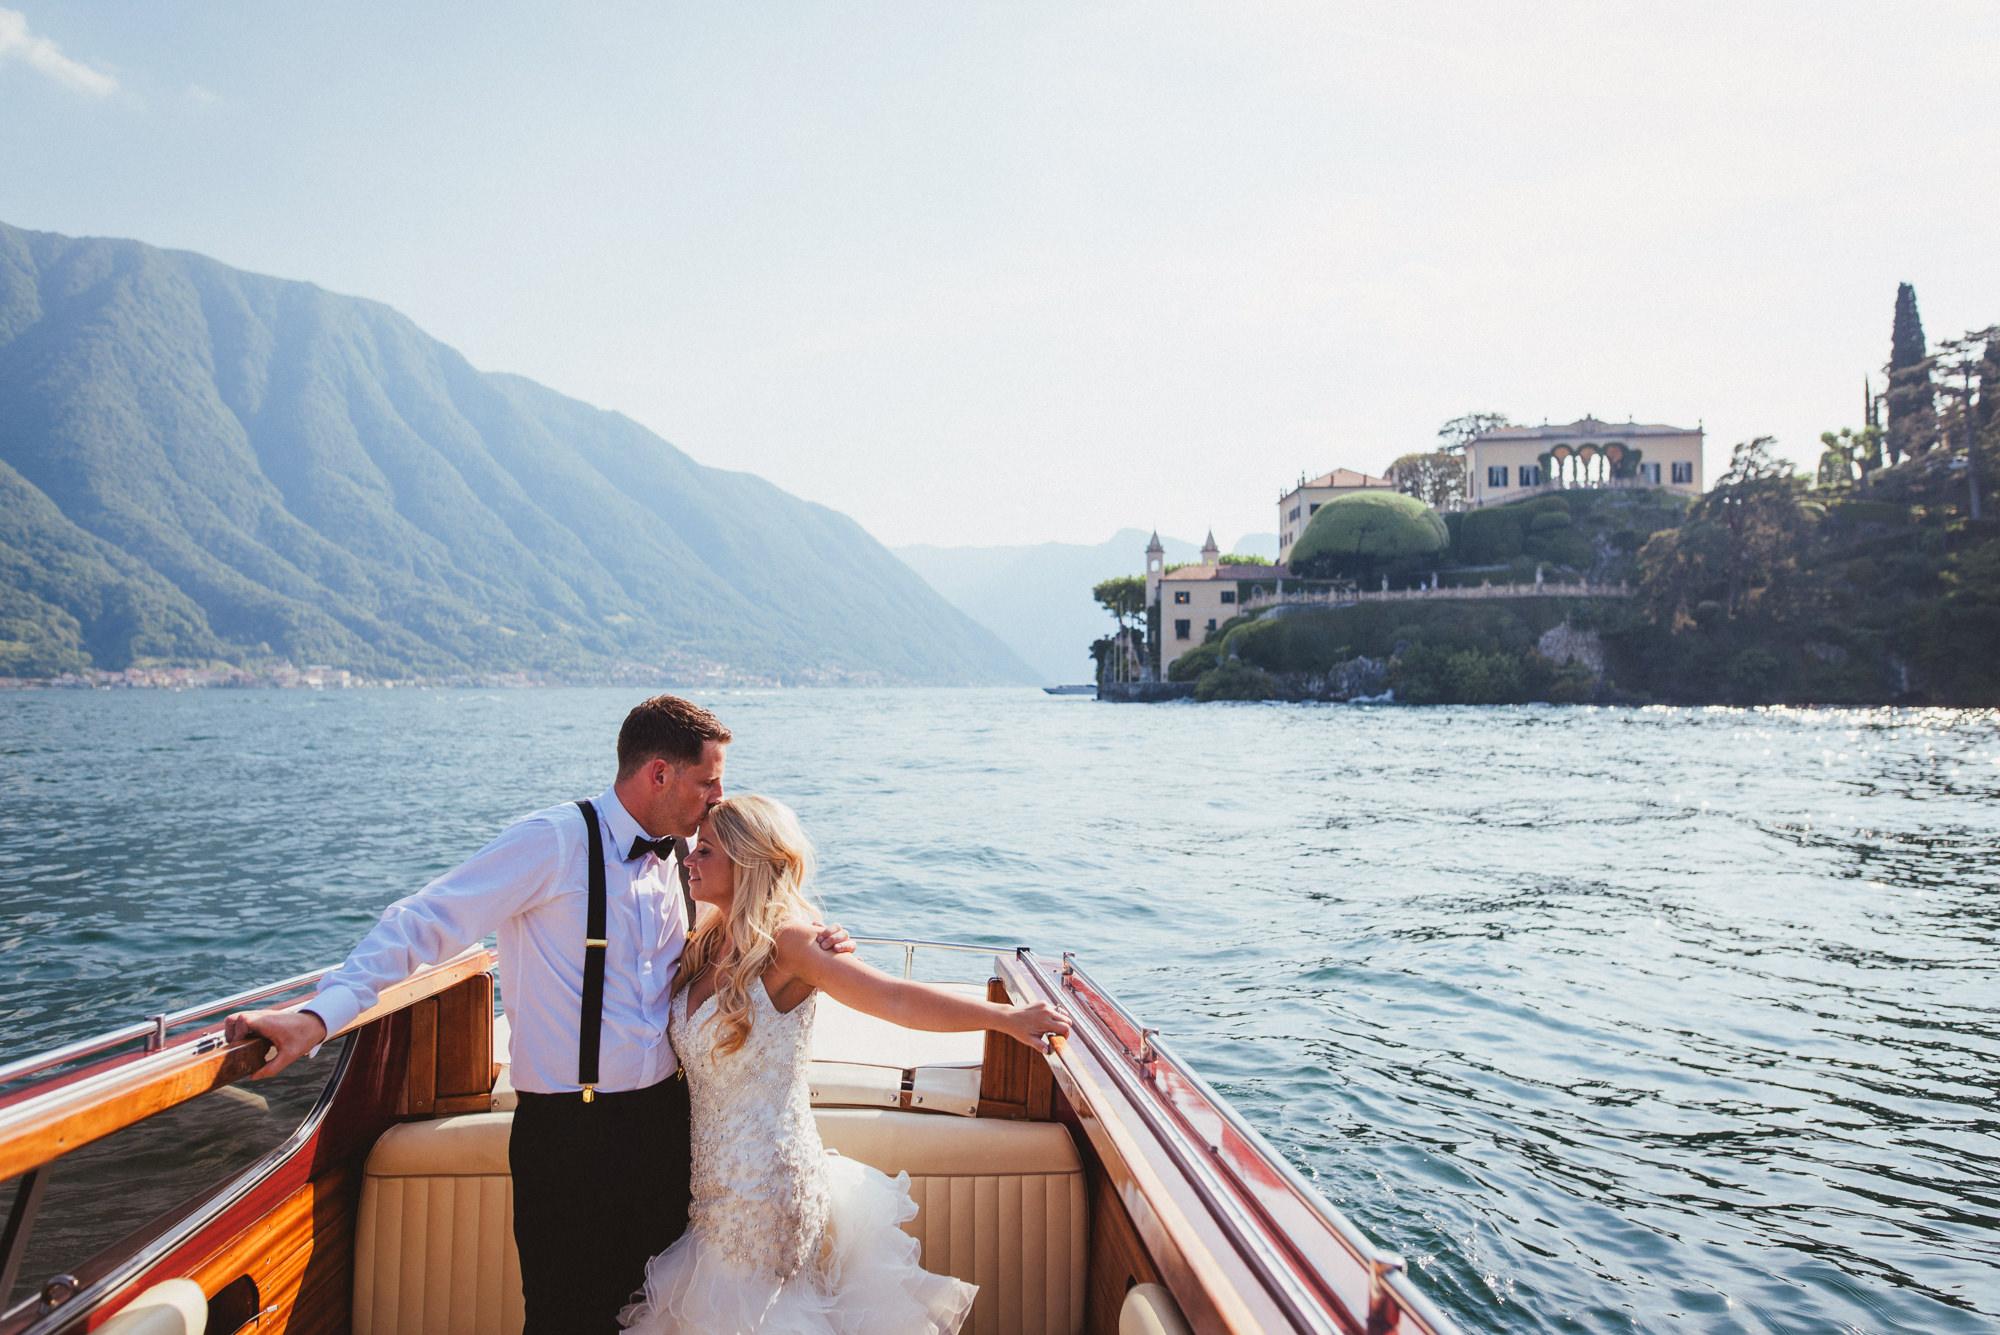 destination wedding photographer italy 022 - Wedding Photographer Venice